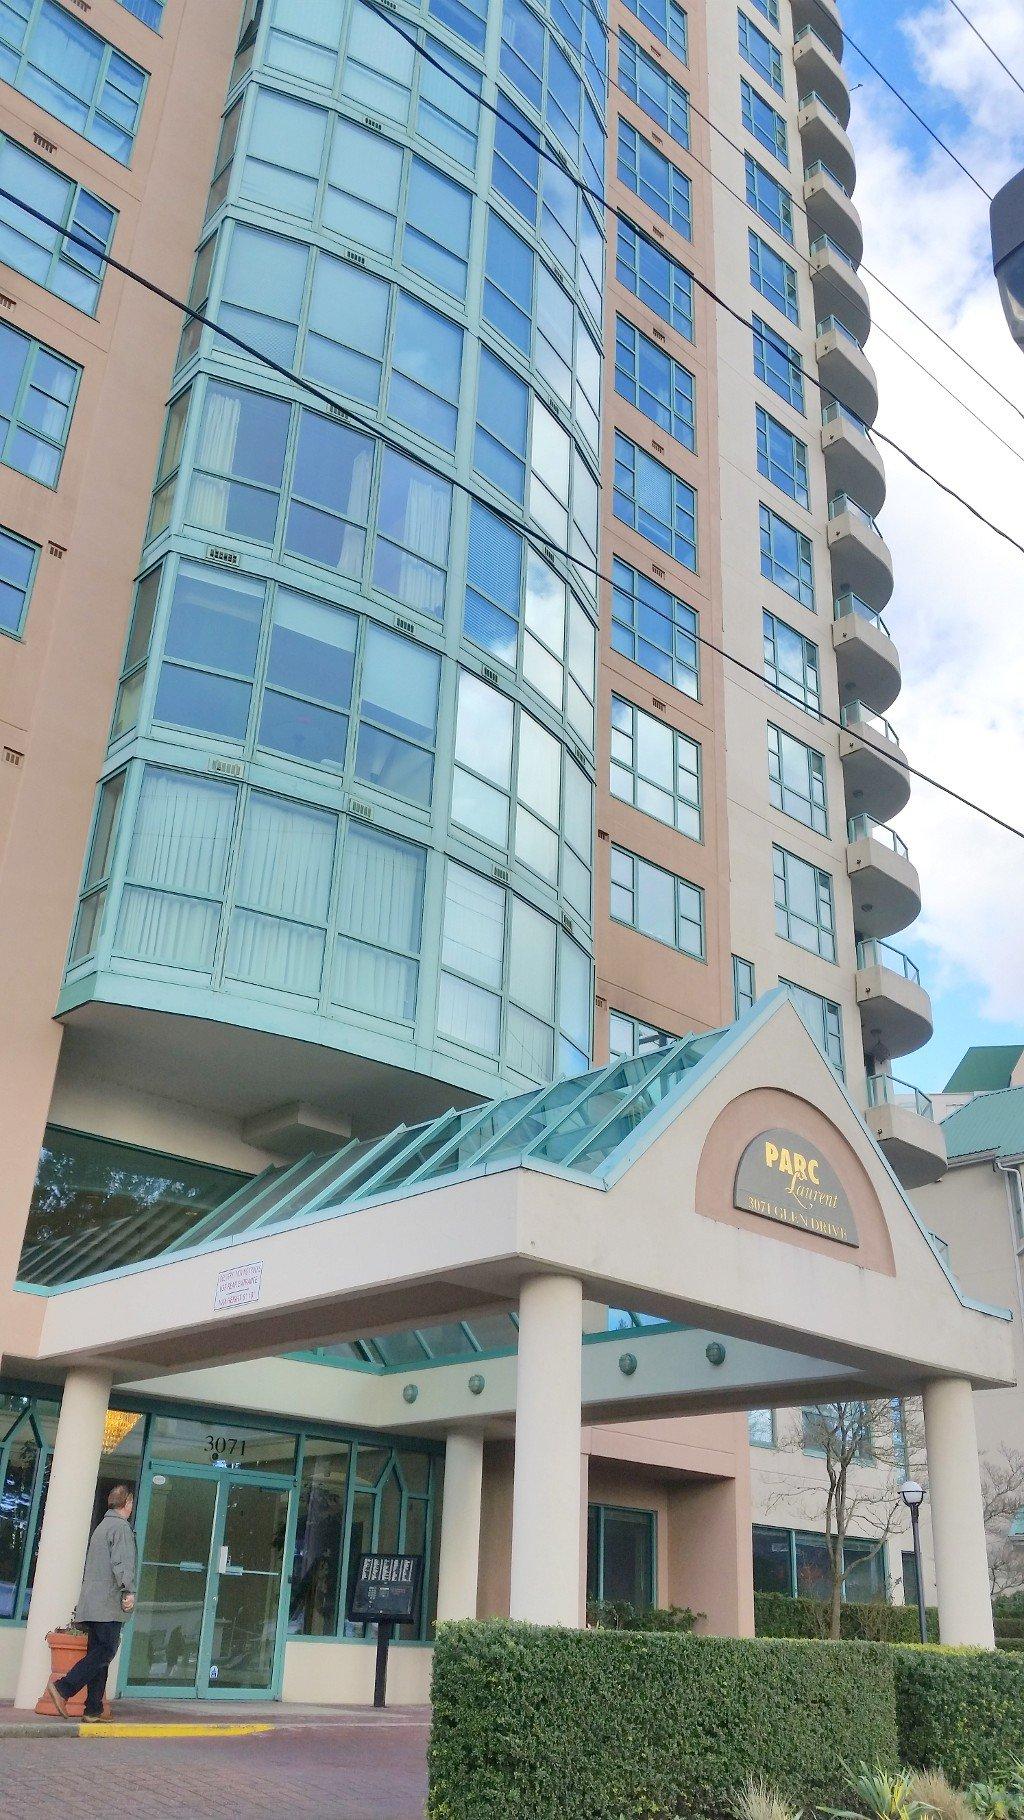 Main Photo: 202 3071 Glen Drive in Coquitlam: North Coquitlam Condo for sale : MLS®# R2039109